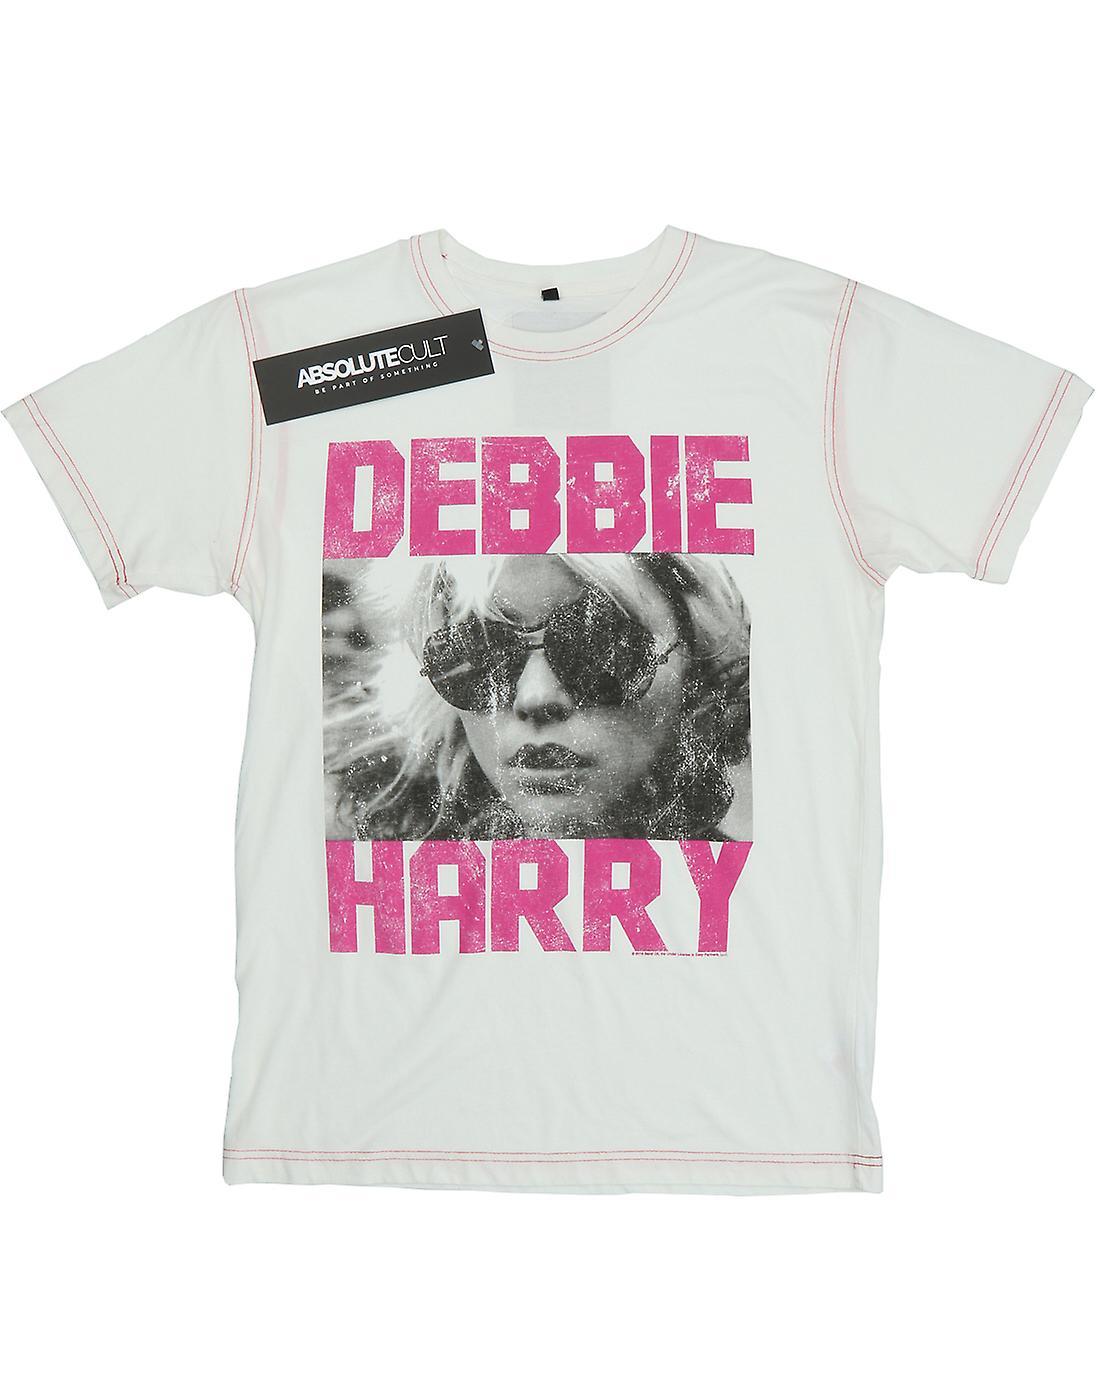 Aftershow Men's Blondie Debbie Harry T-Shirt